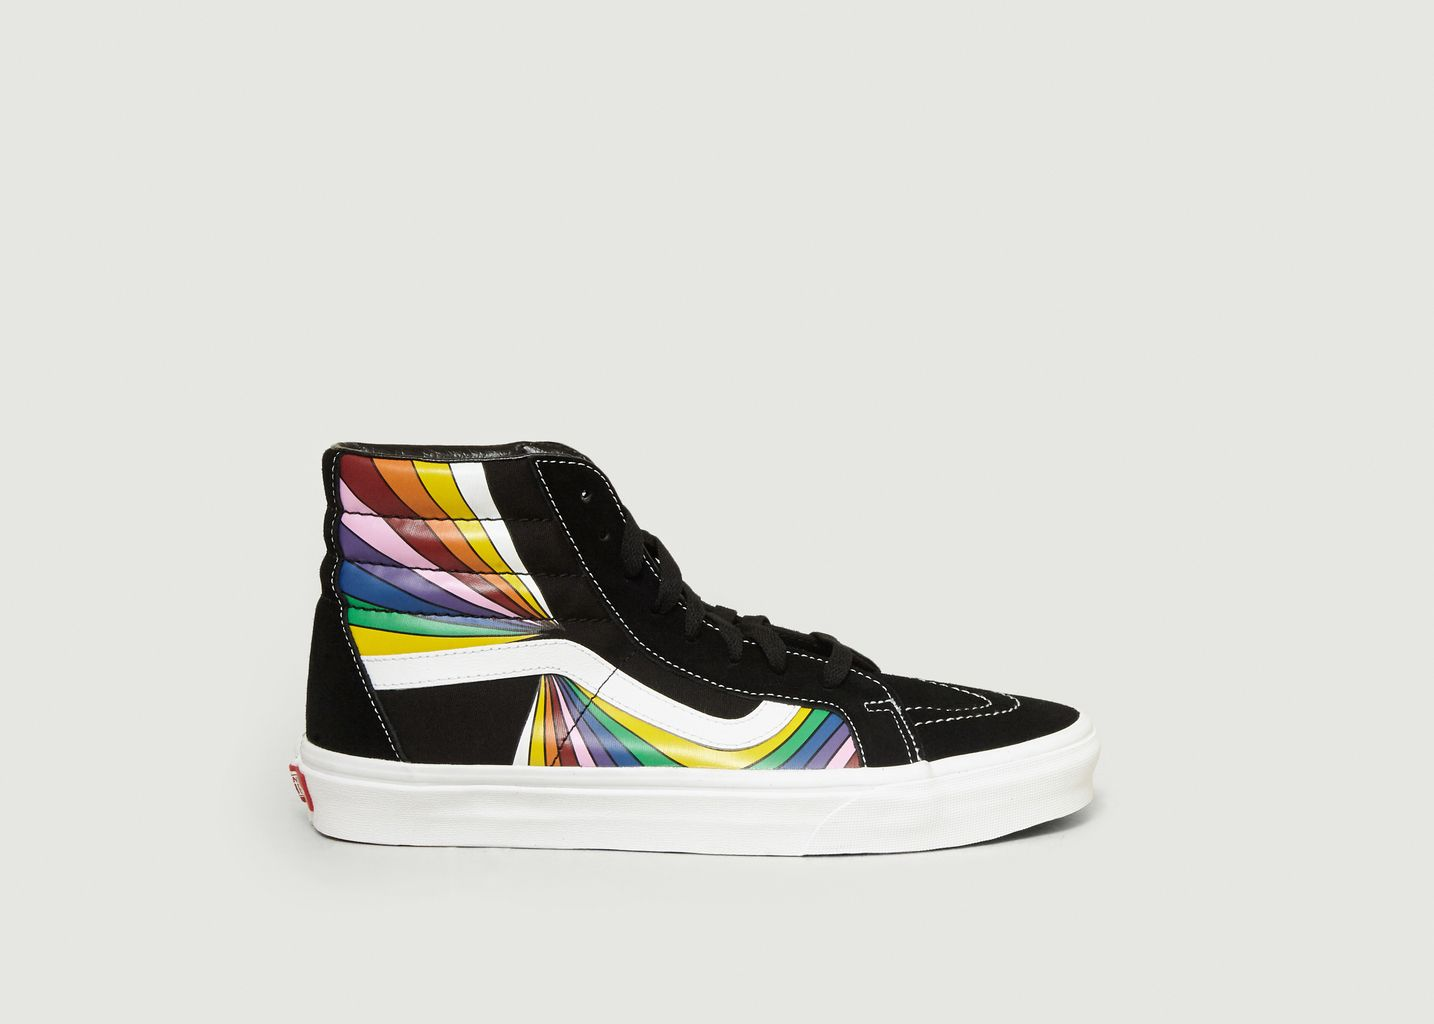 Sneakers Refract Sk8-Hi Reissue - Vans